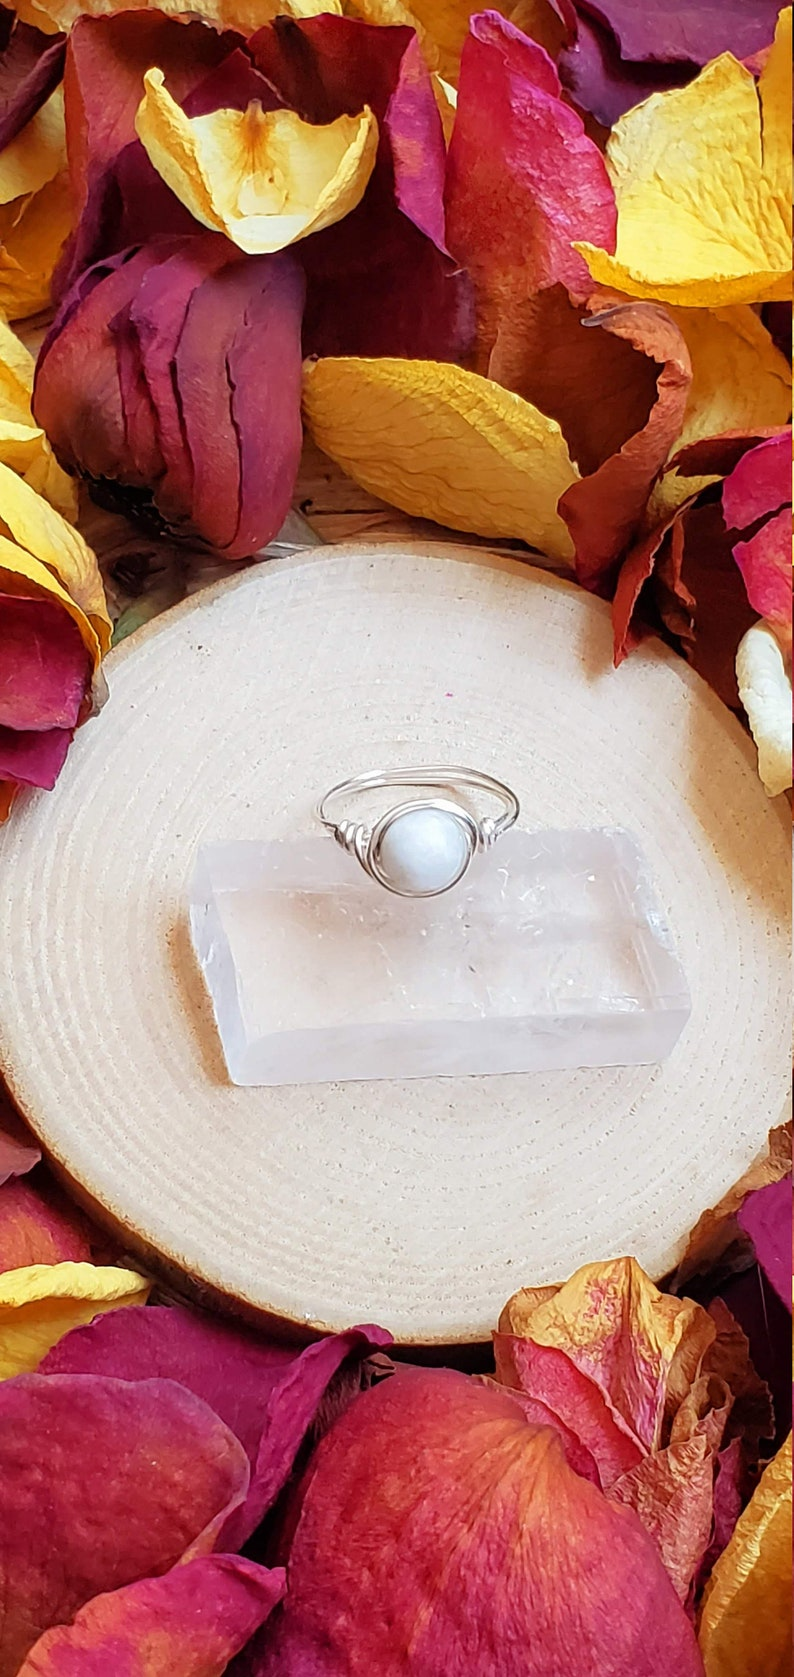 Celestial Jewelry Healing Stone Spiritual Stone Dainty Moonstone Ring Reiki Charged Reiki Infused Healing Crystal Reiki Ring